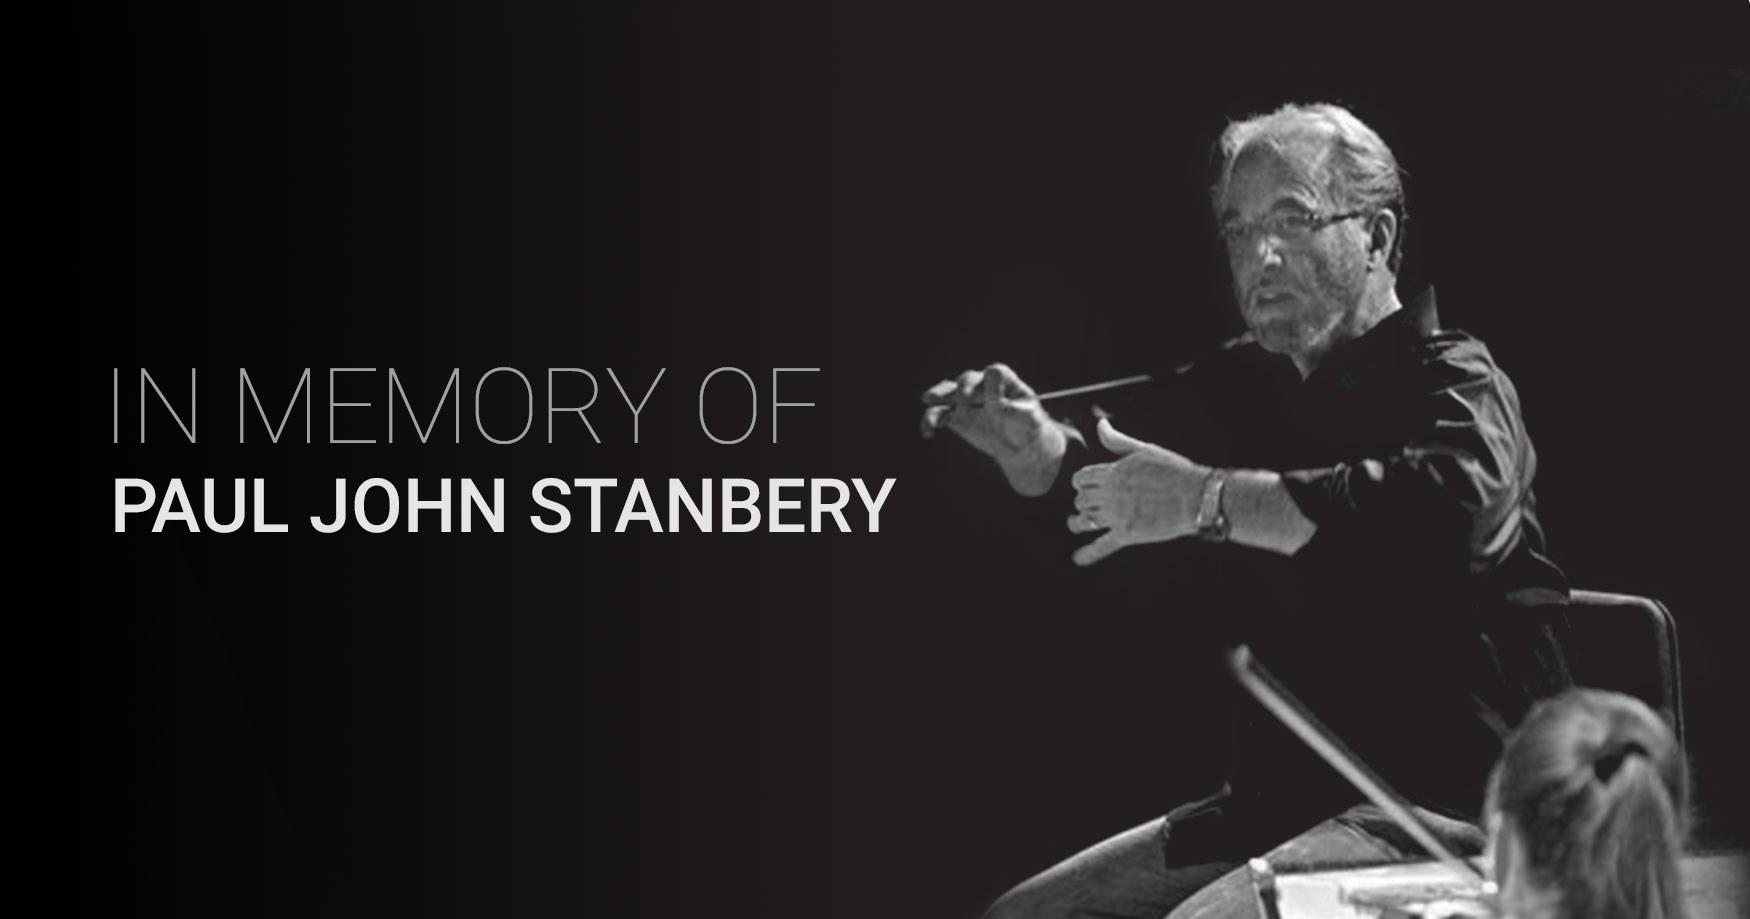 Paul John Stanberry